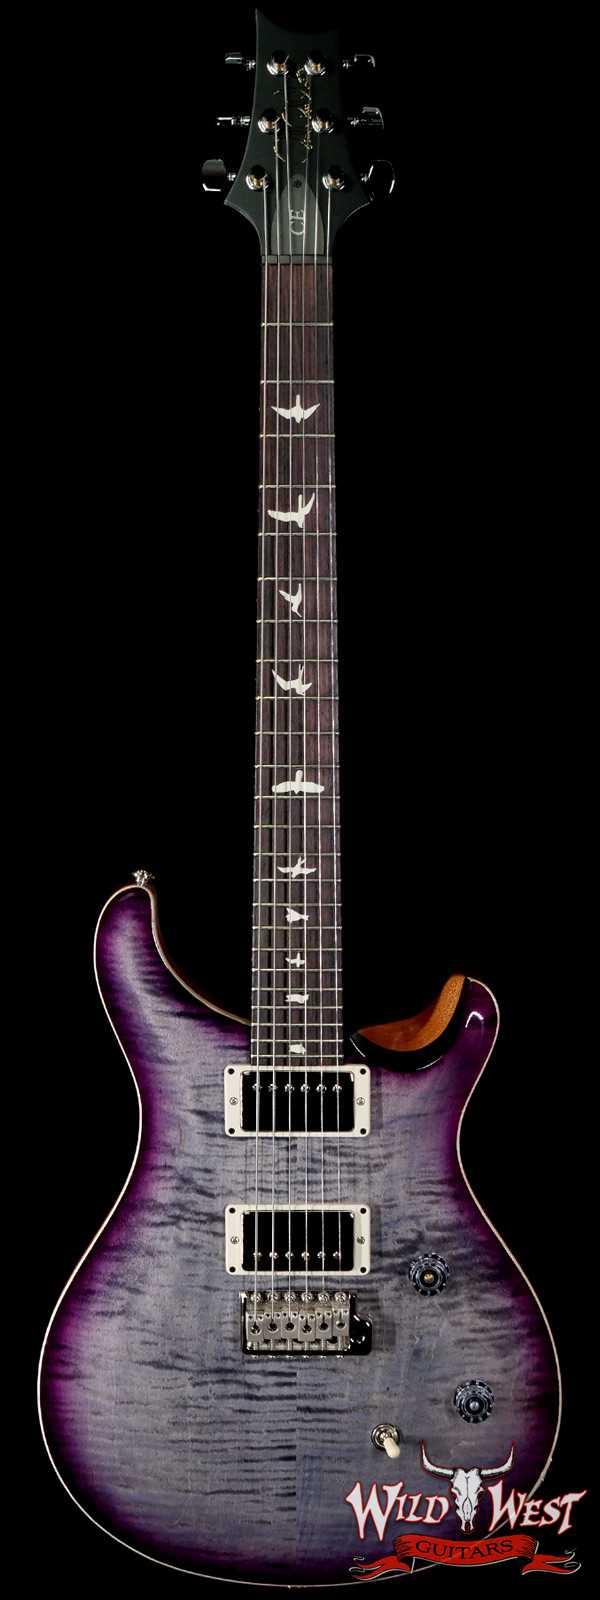 PRS Wild West Guitars Special Run Flame Top Black Neck CE 24 Faded Gray Black Purple Burst 317457